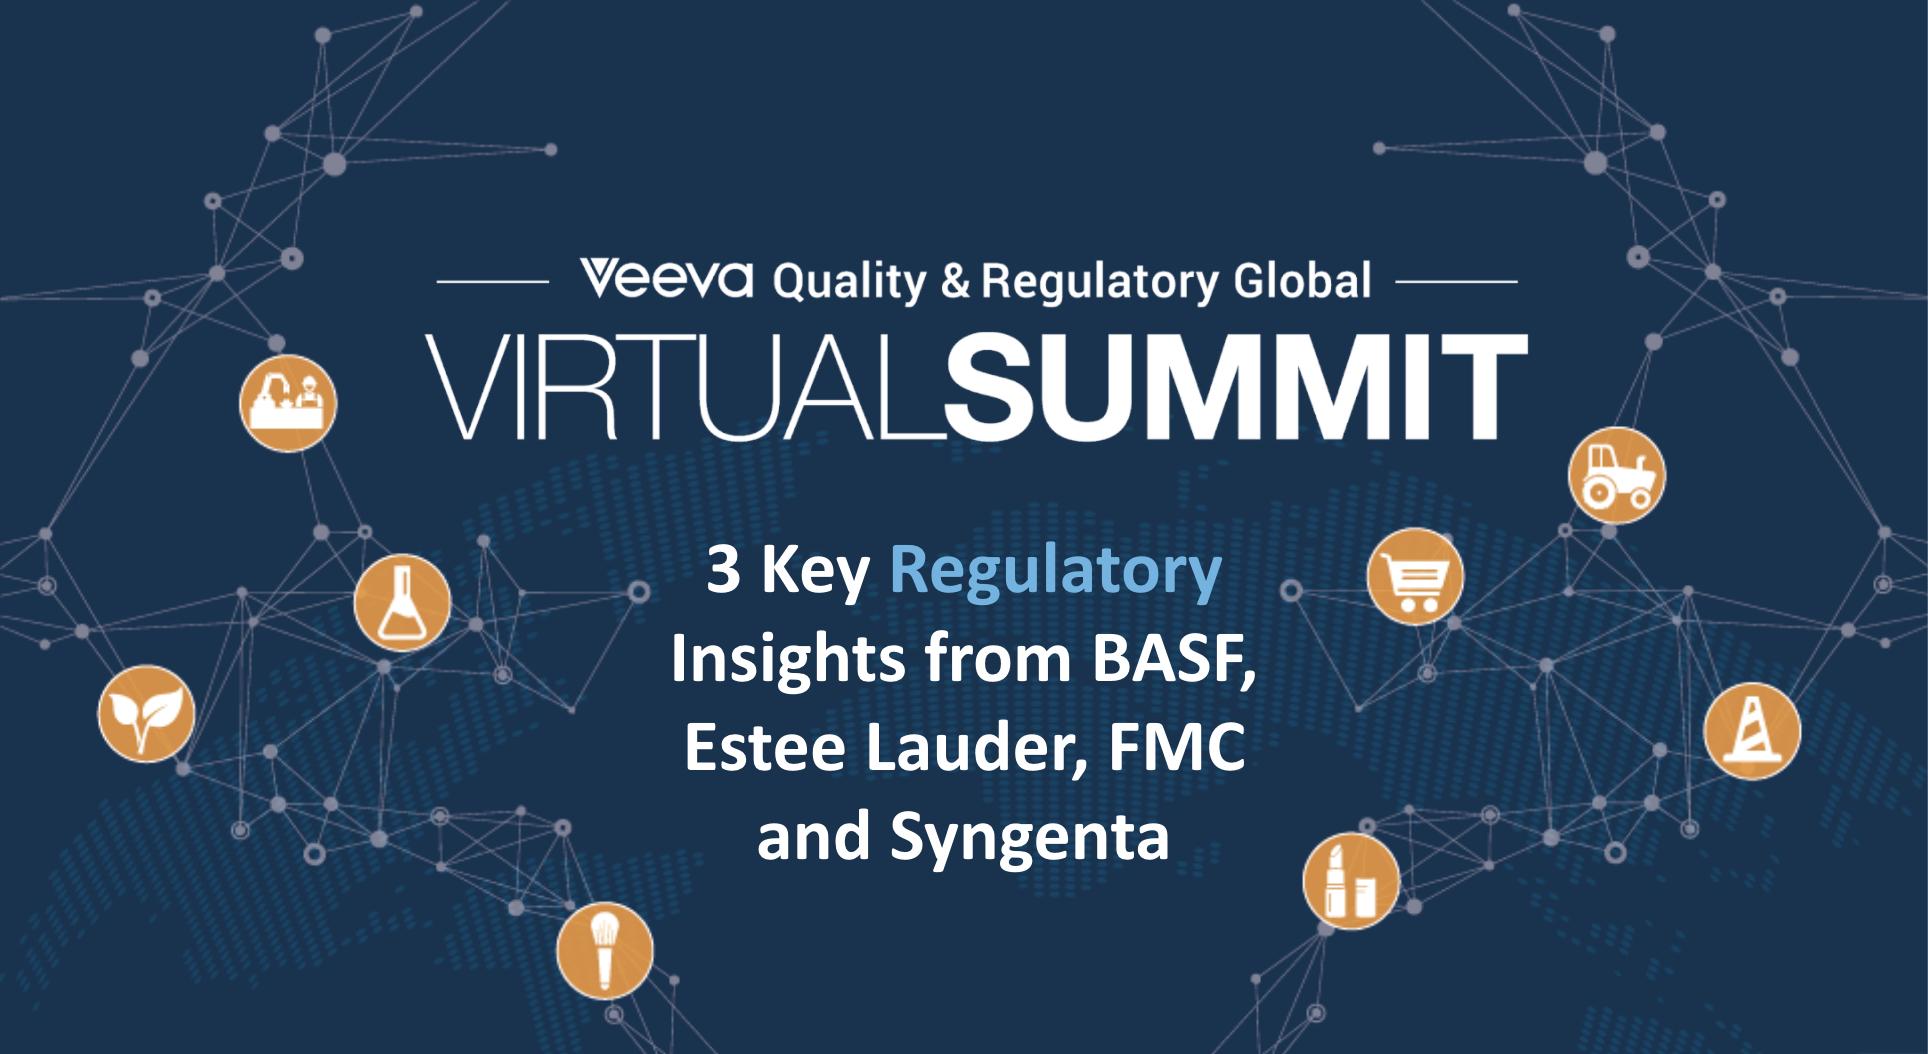 2020 Veeva Quality & Regulatory Virtual Summit - 3 Key Regulatory Insights